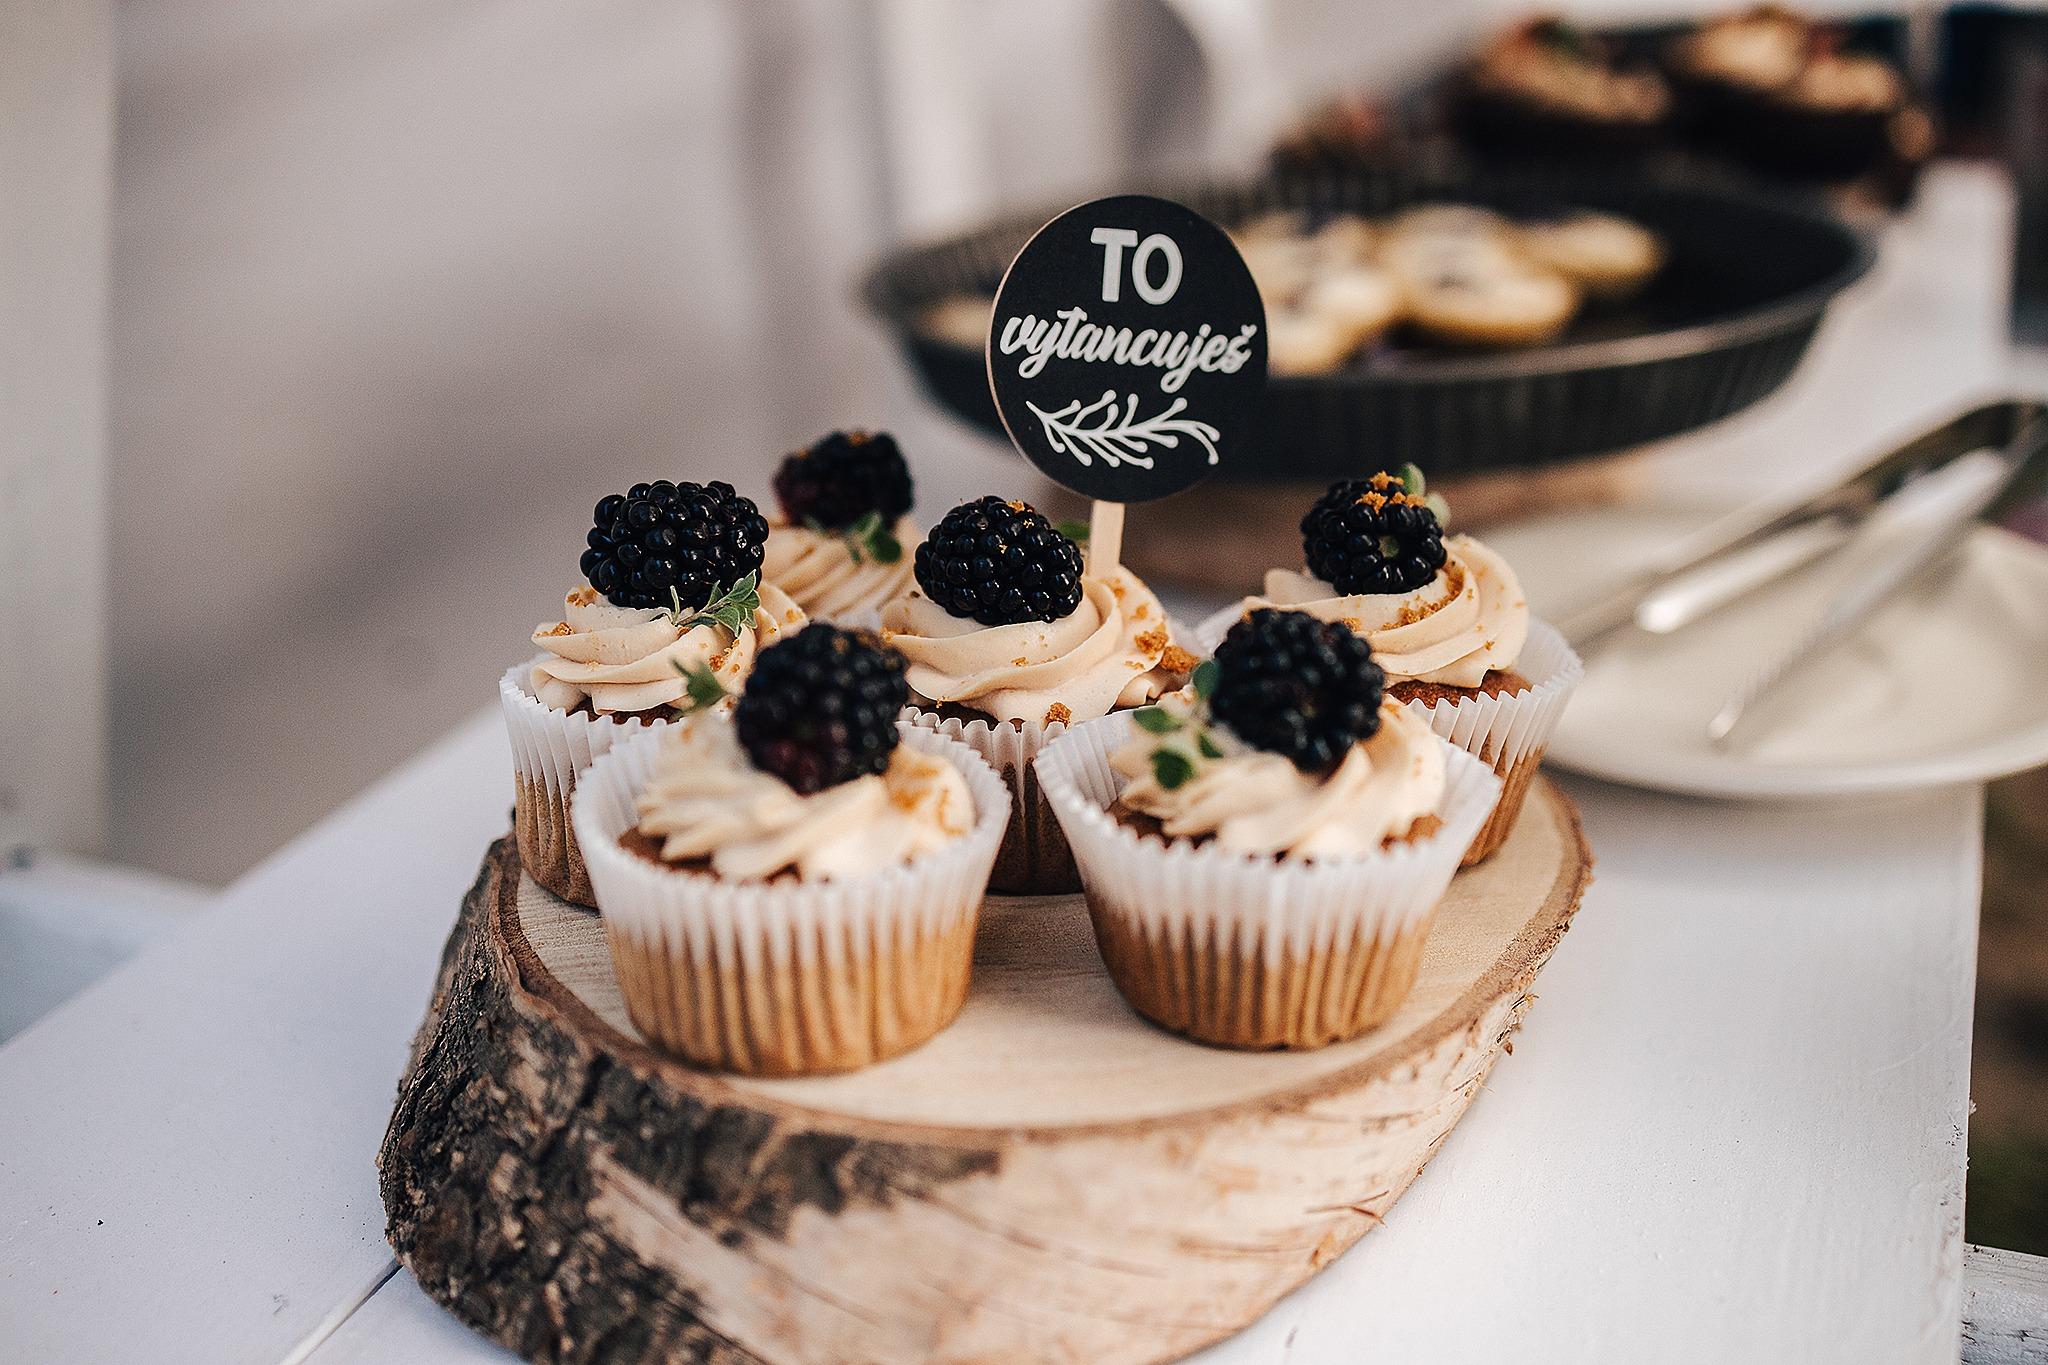 svatební dort jičín fotograf